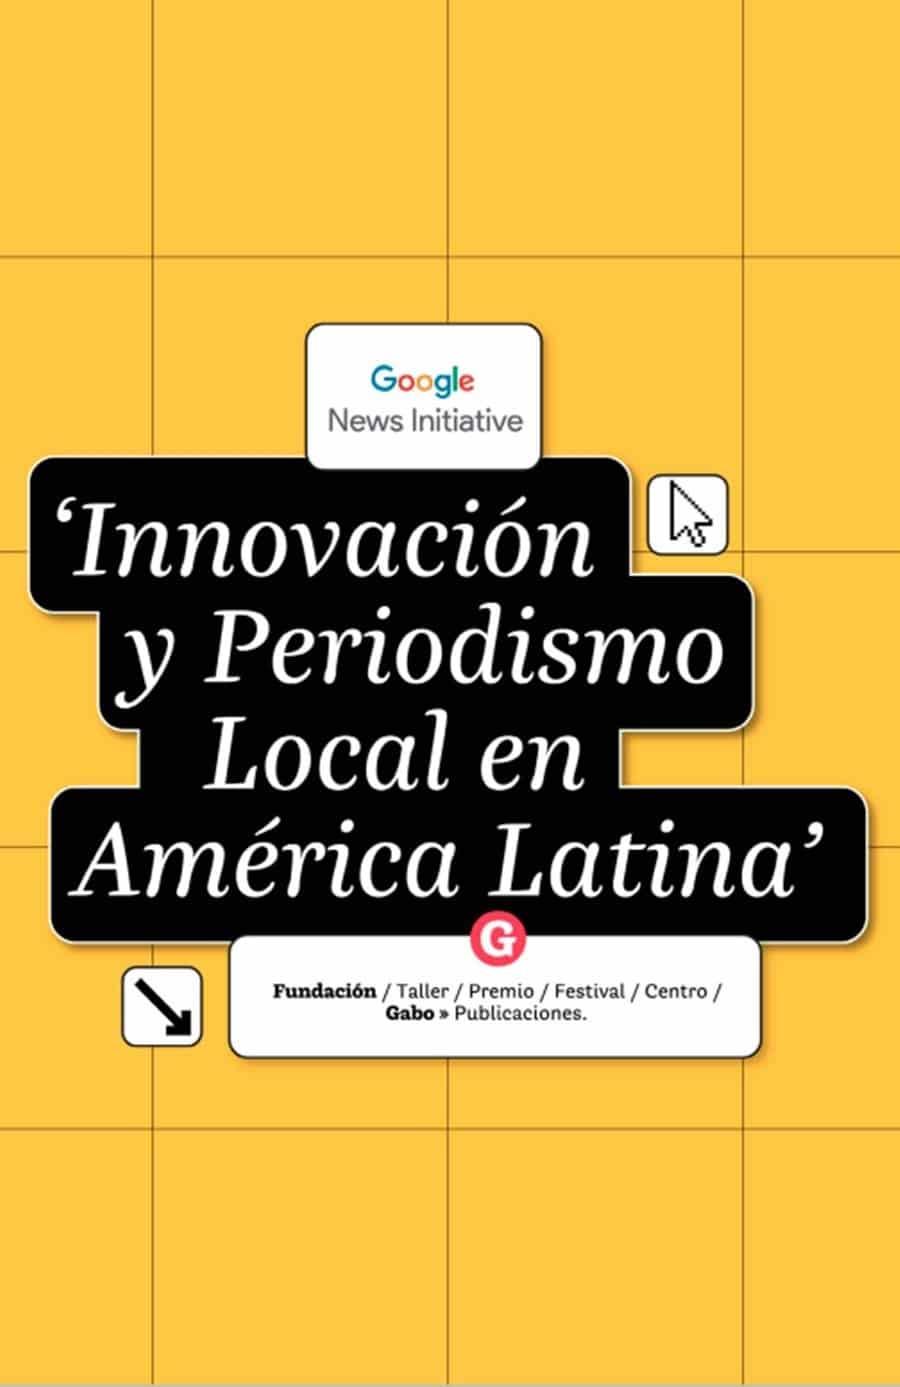 Innovación y periodismo local en América Latina